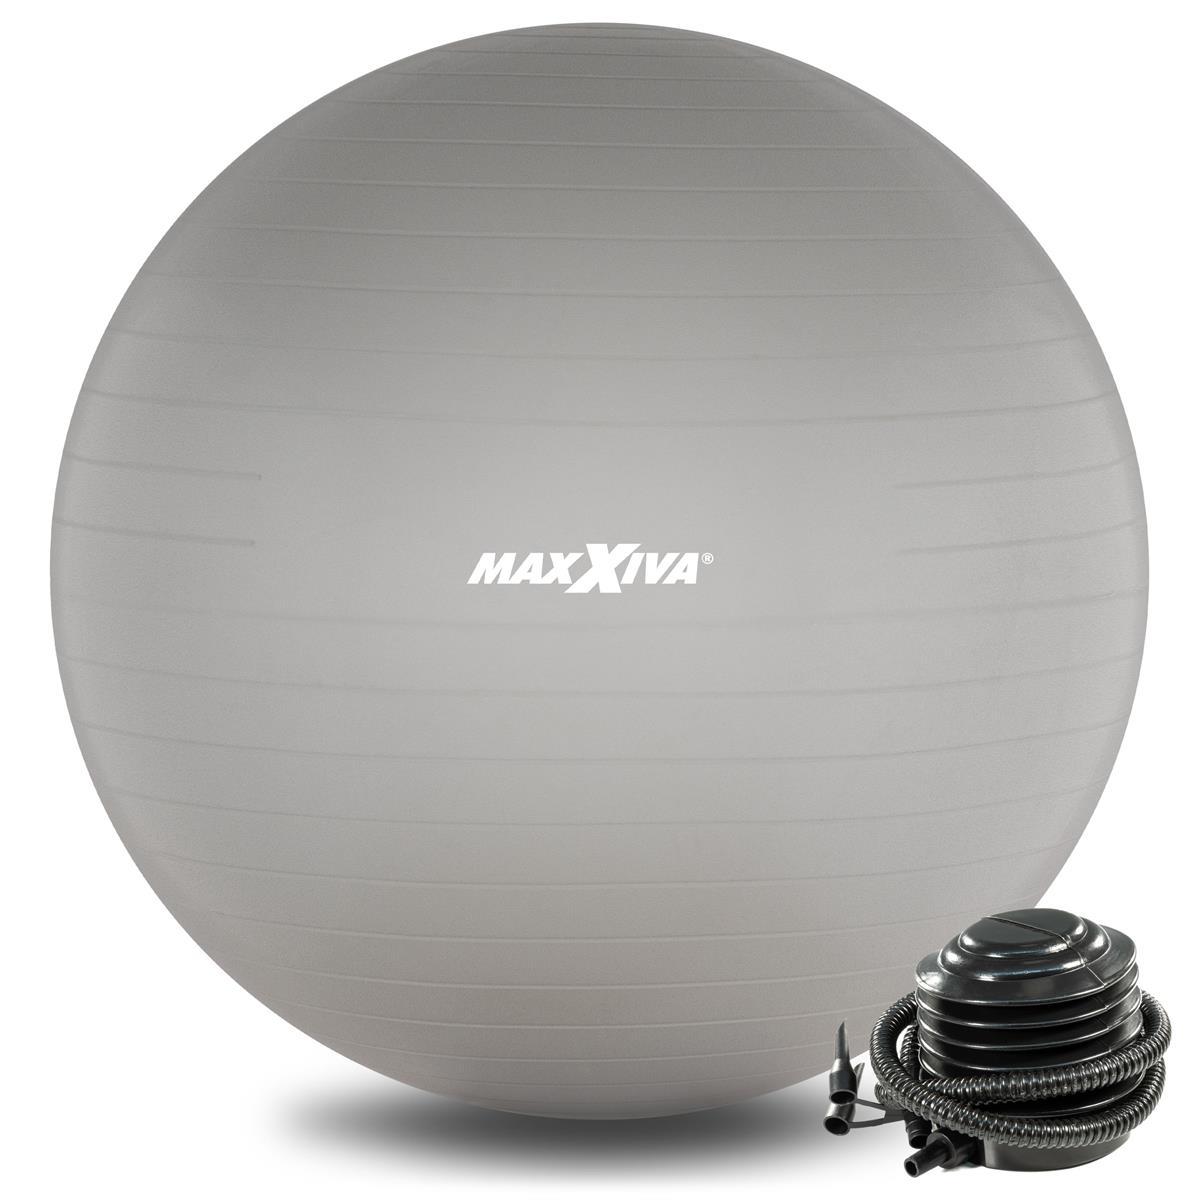 MAXXIVA Gymnastikball Ø 65 cm Silber mit Pumpe Sitzball Fitness Yoga Pilates